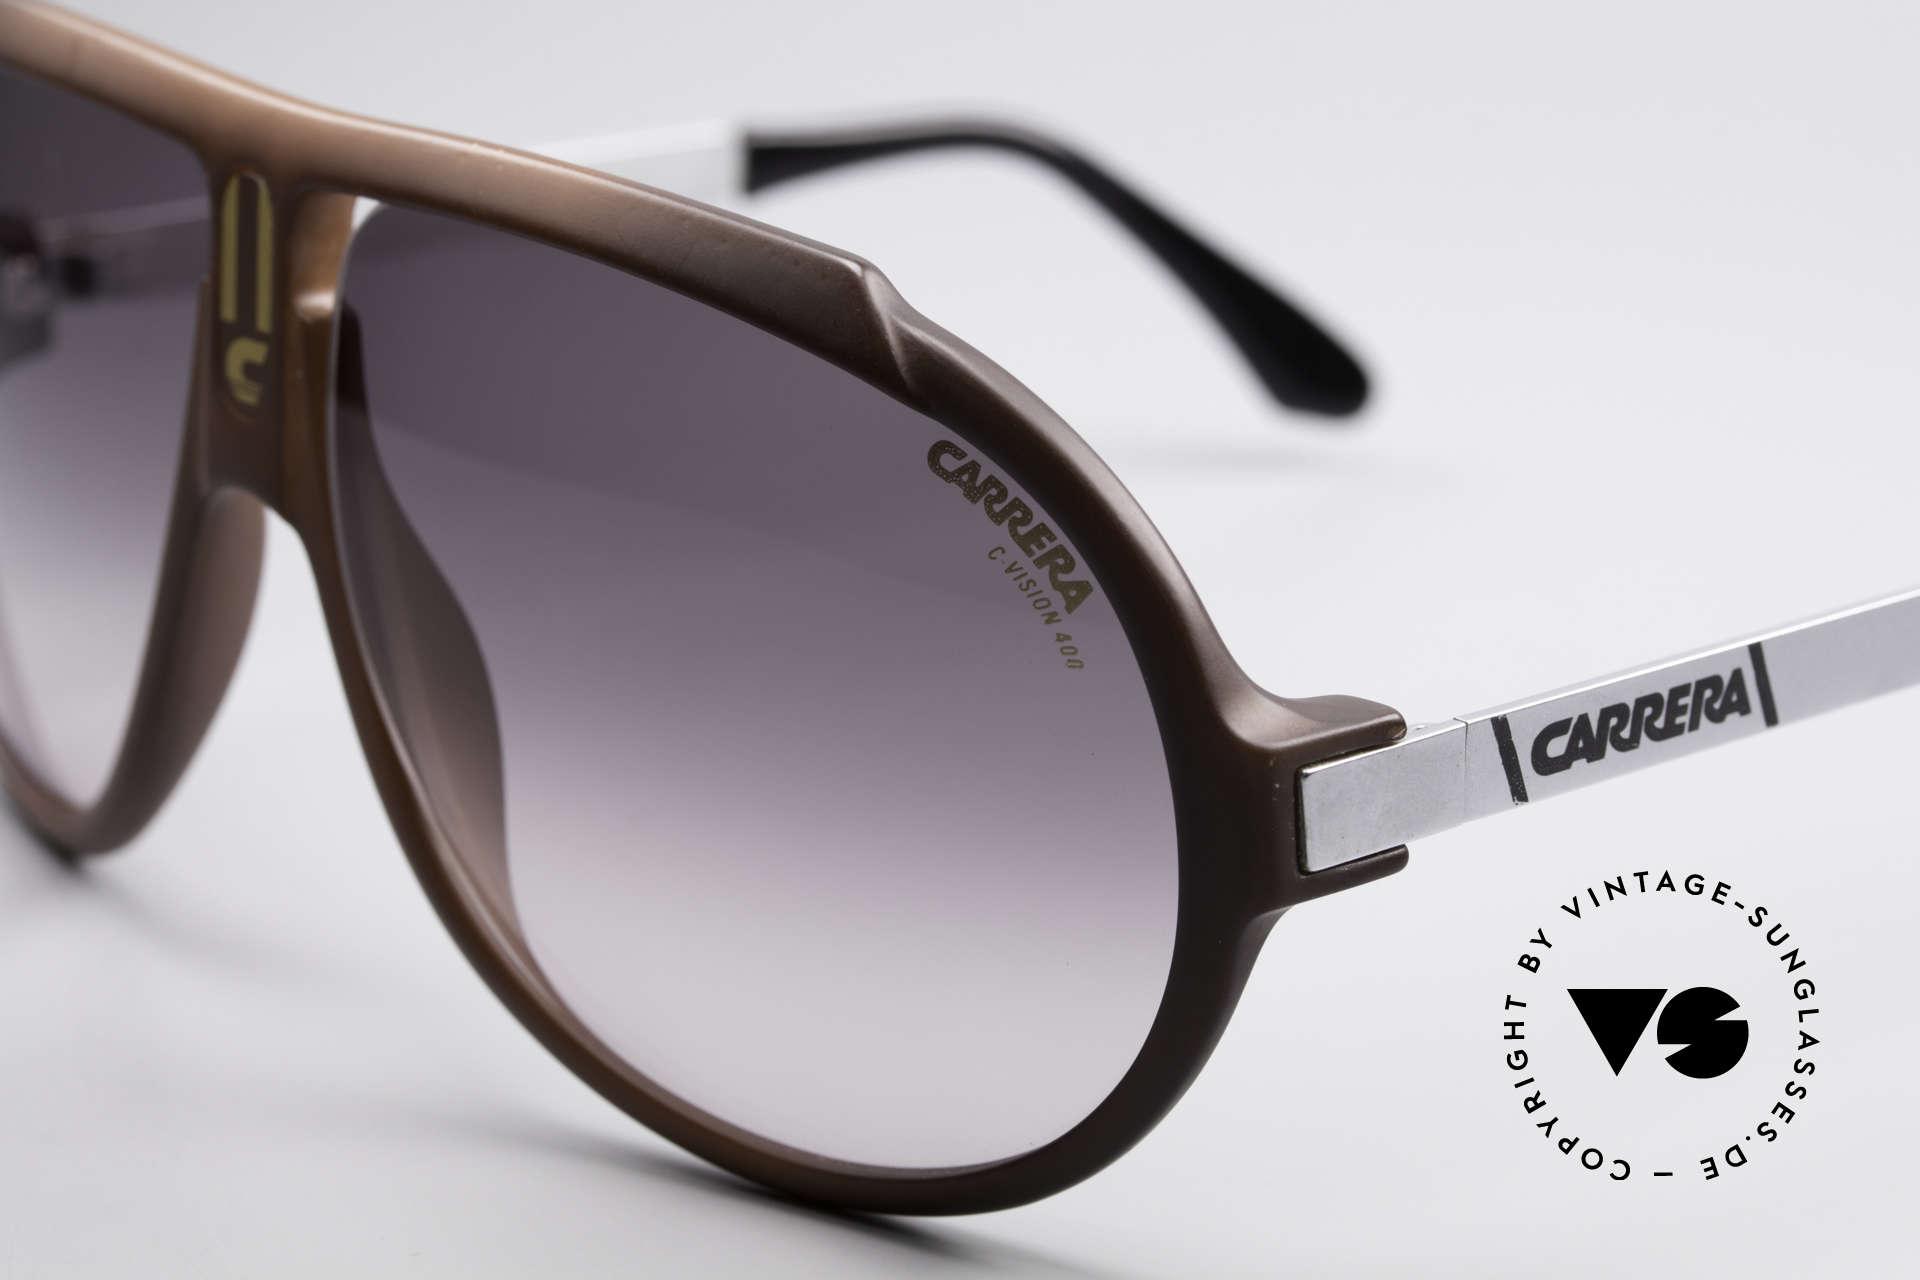 57cd5f8a3963 Sunglasses Carrera 5512 Don Johnson Miami Vice Shades   Vintage ...